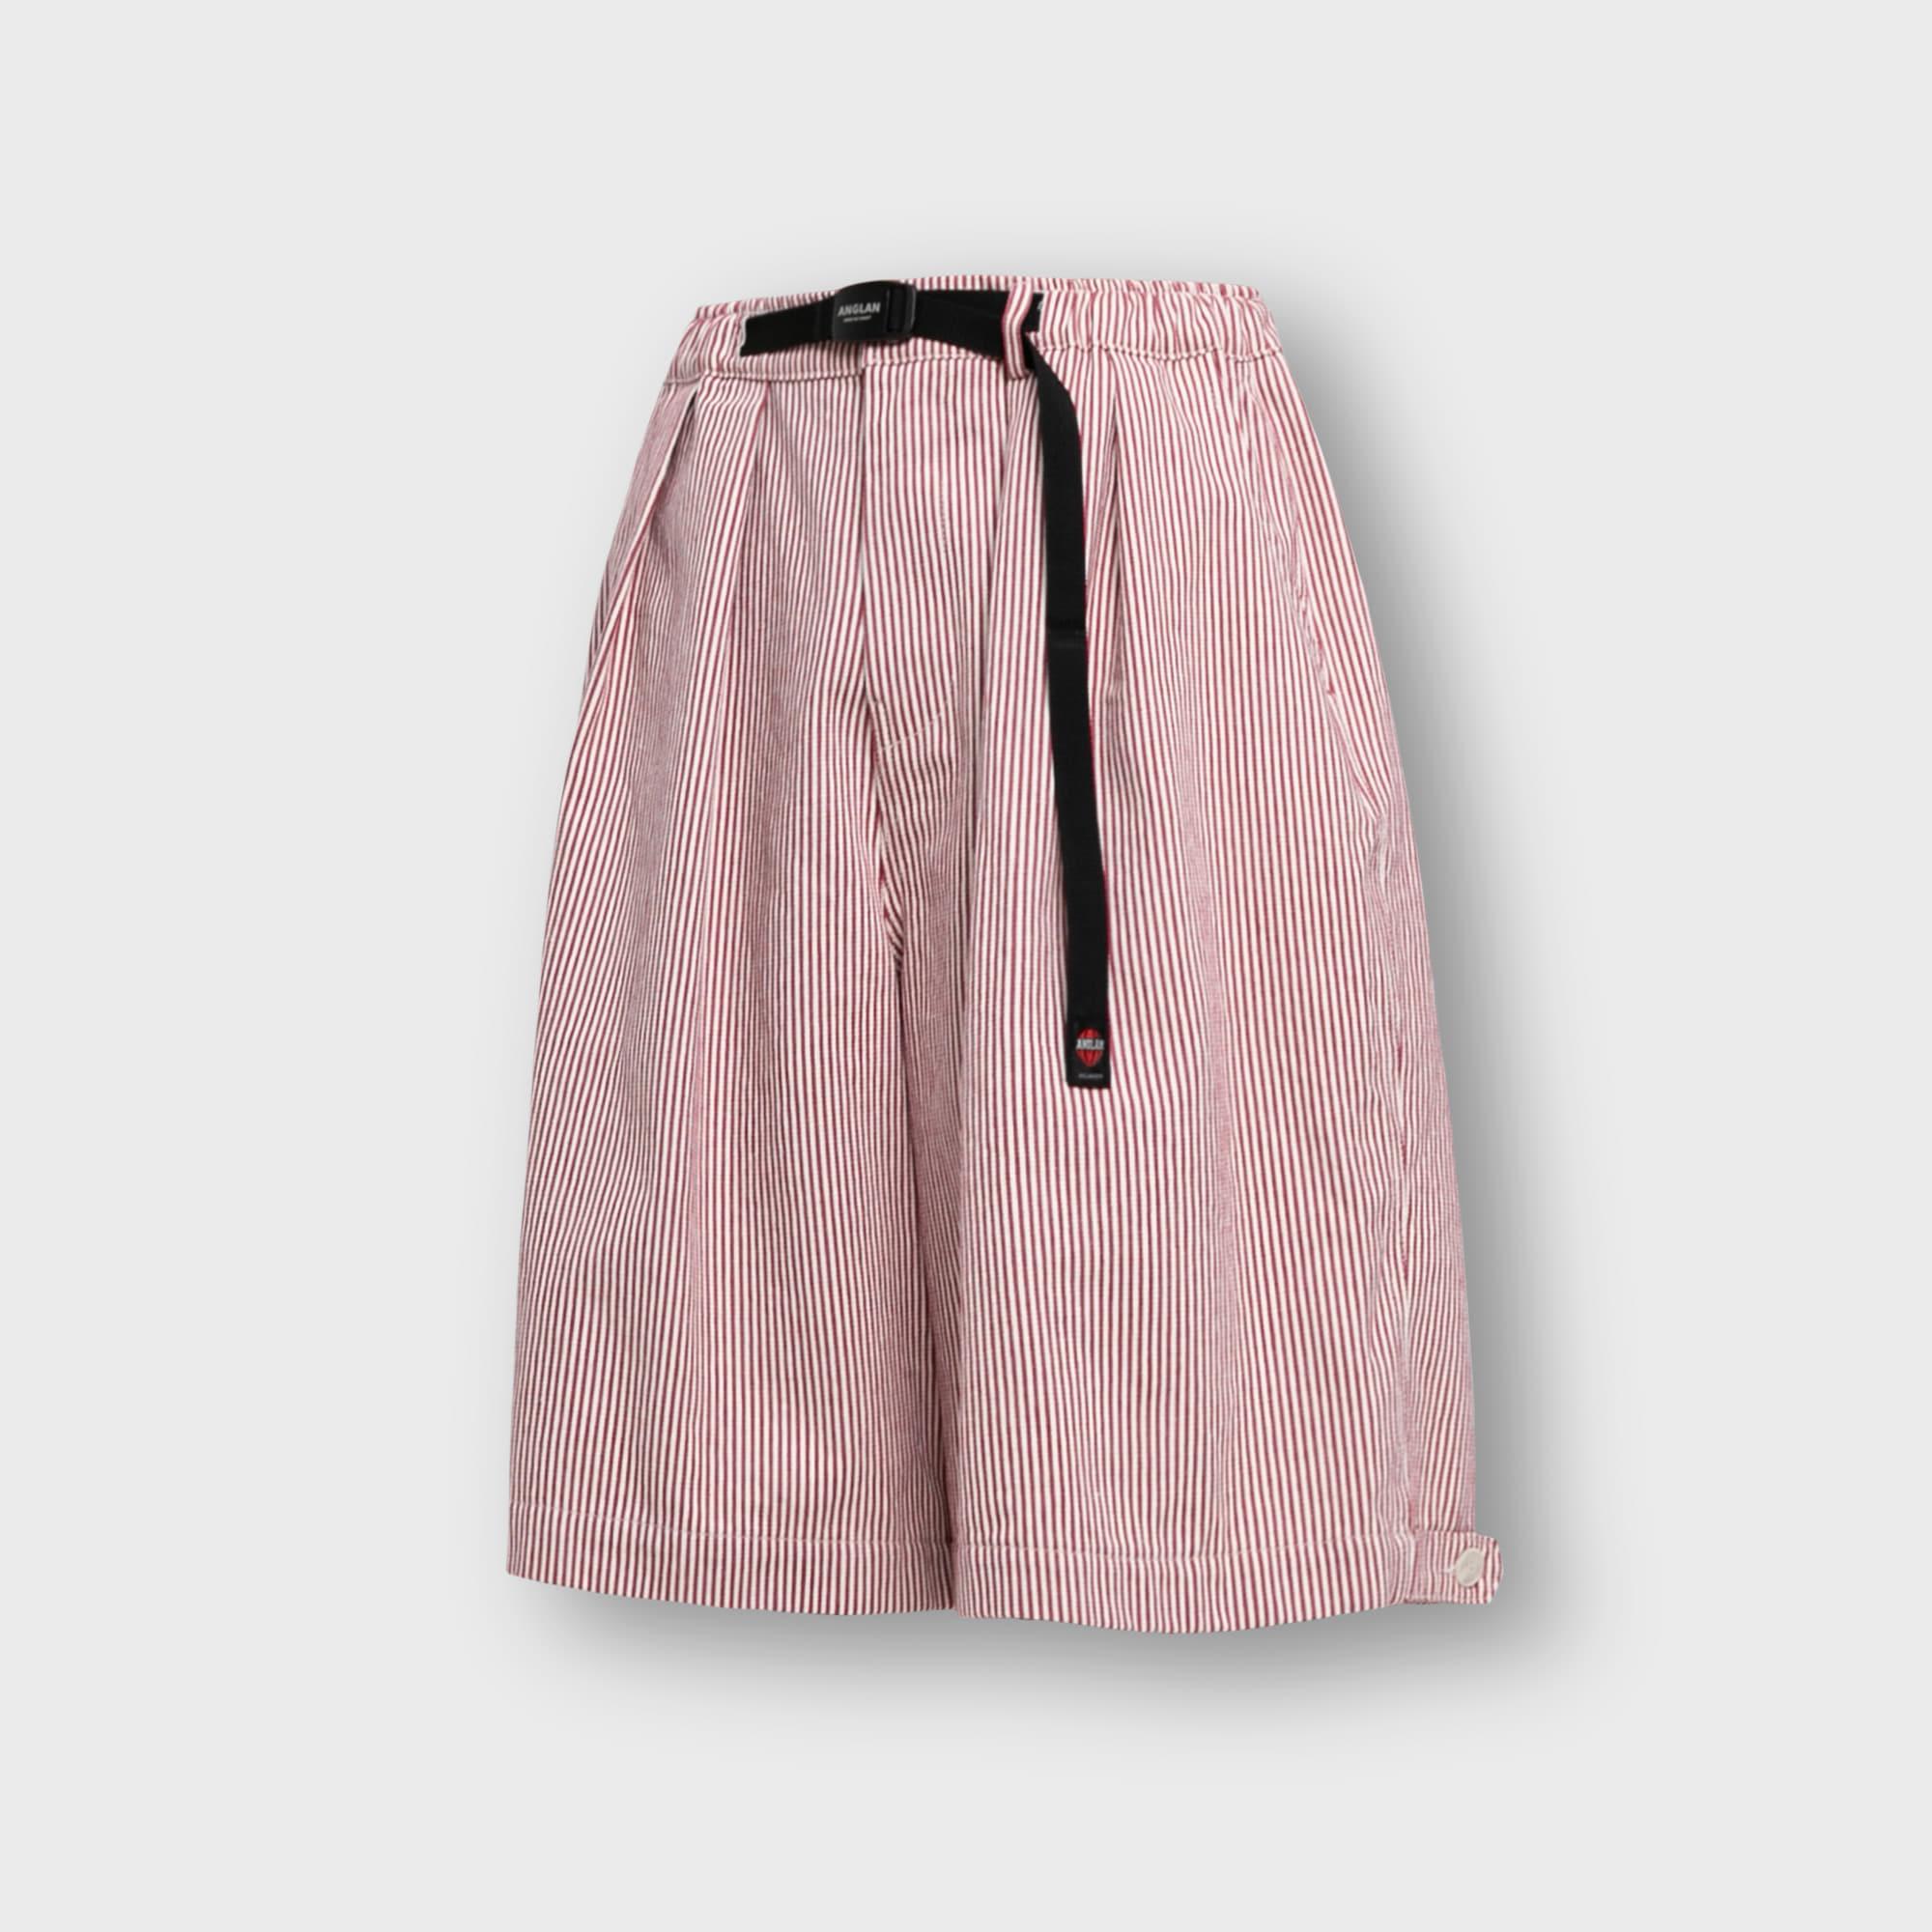 [AG] Hickory Wide Vijo Half Pants - Red